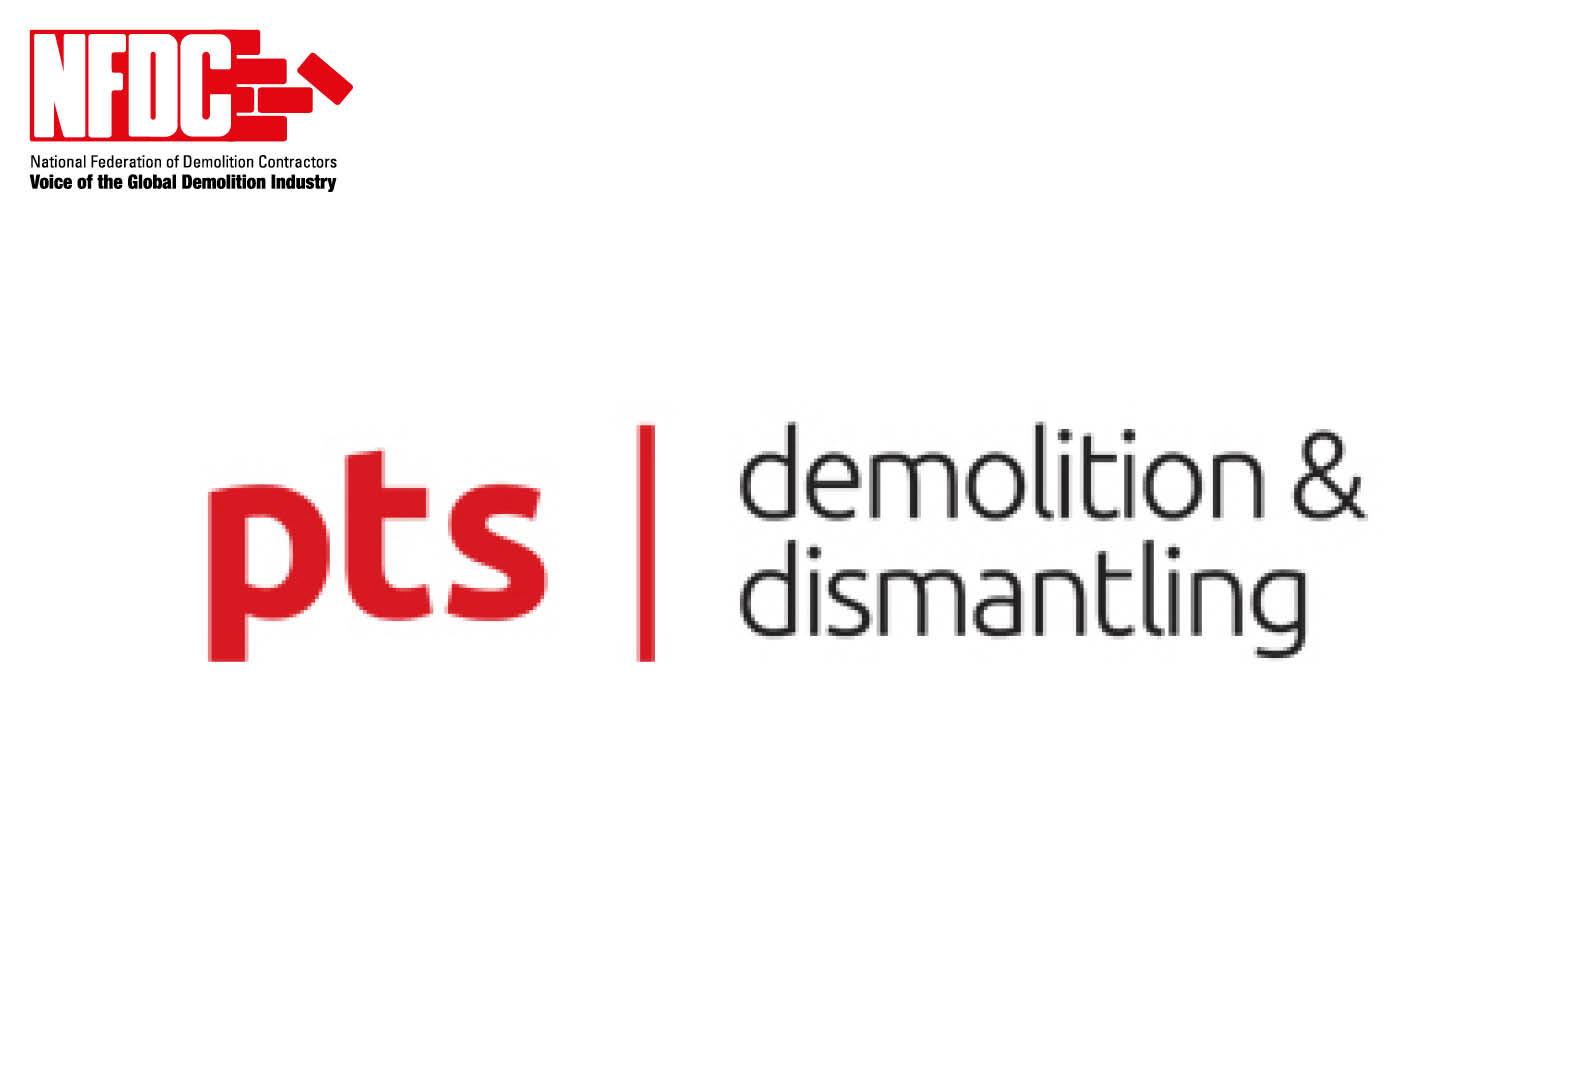 PTS Demolition